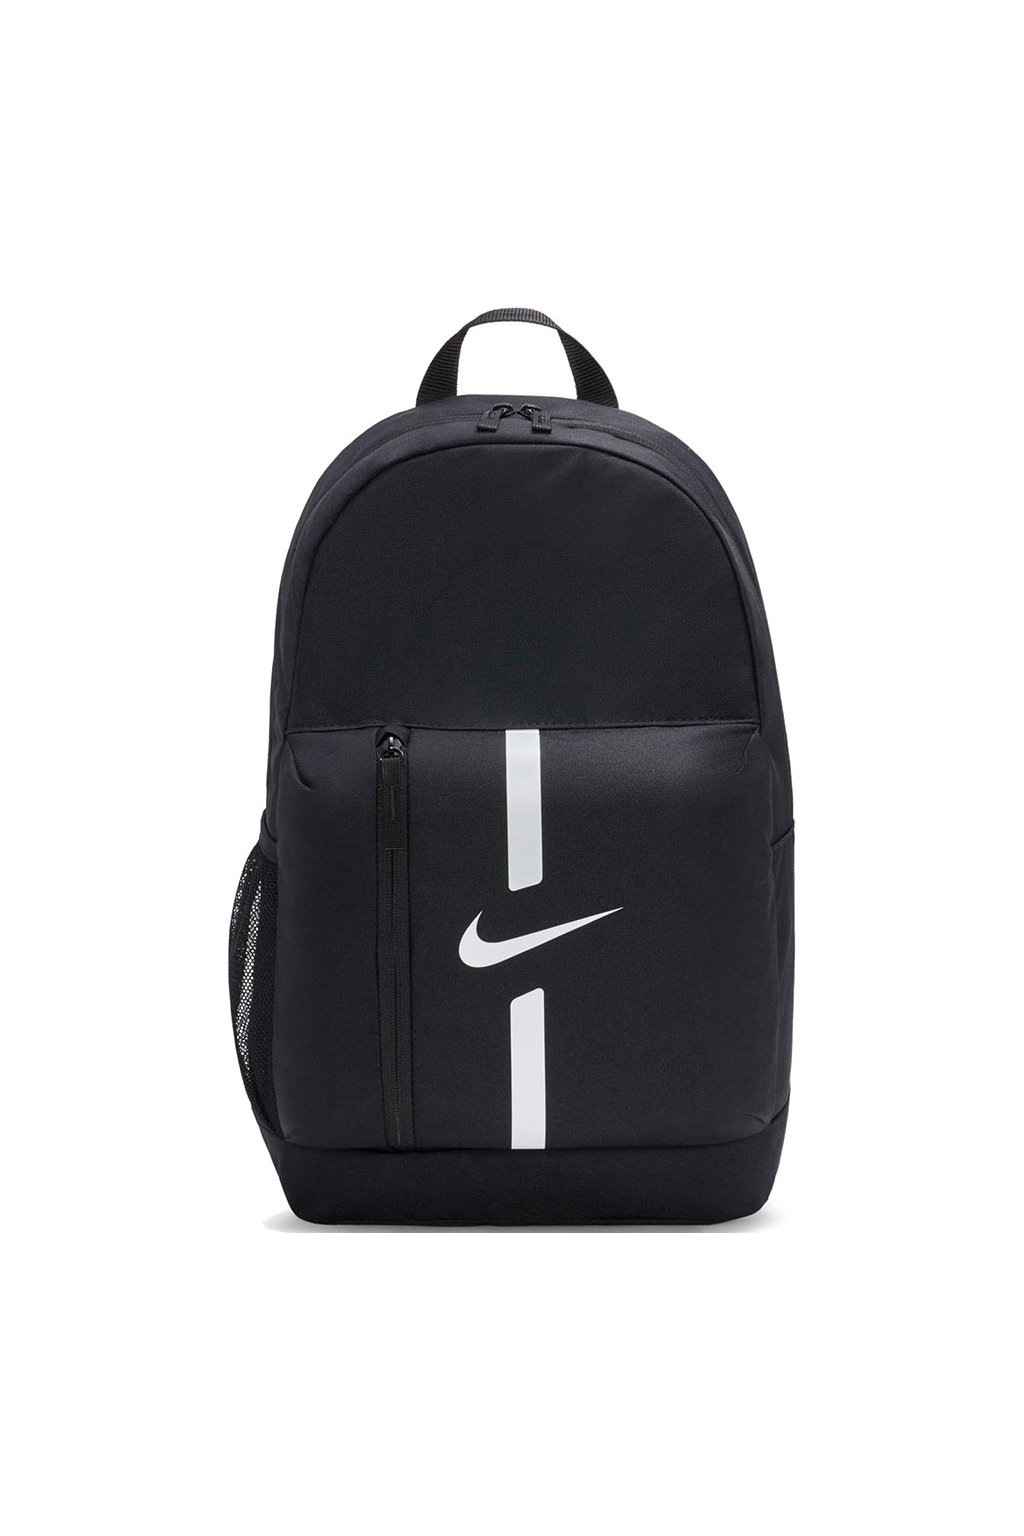 Batoh Nike Academy Team čierny DA2571 010